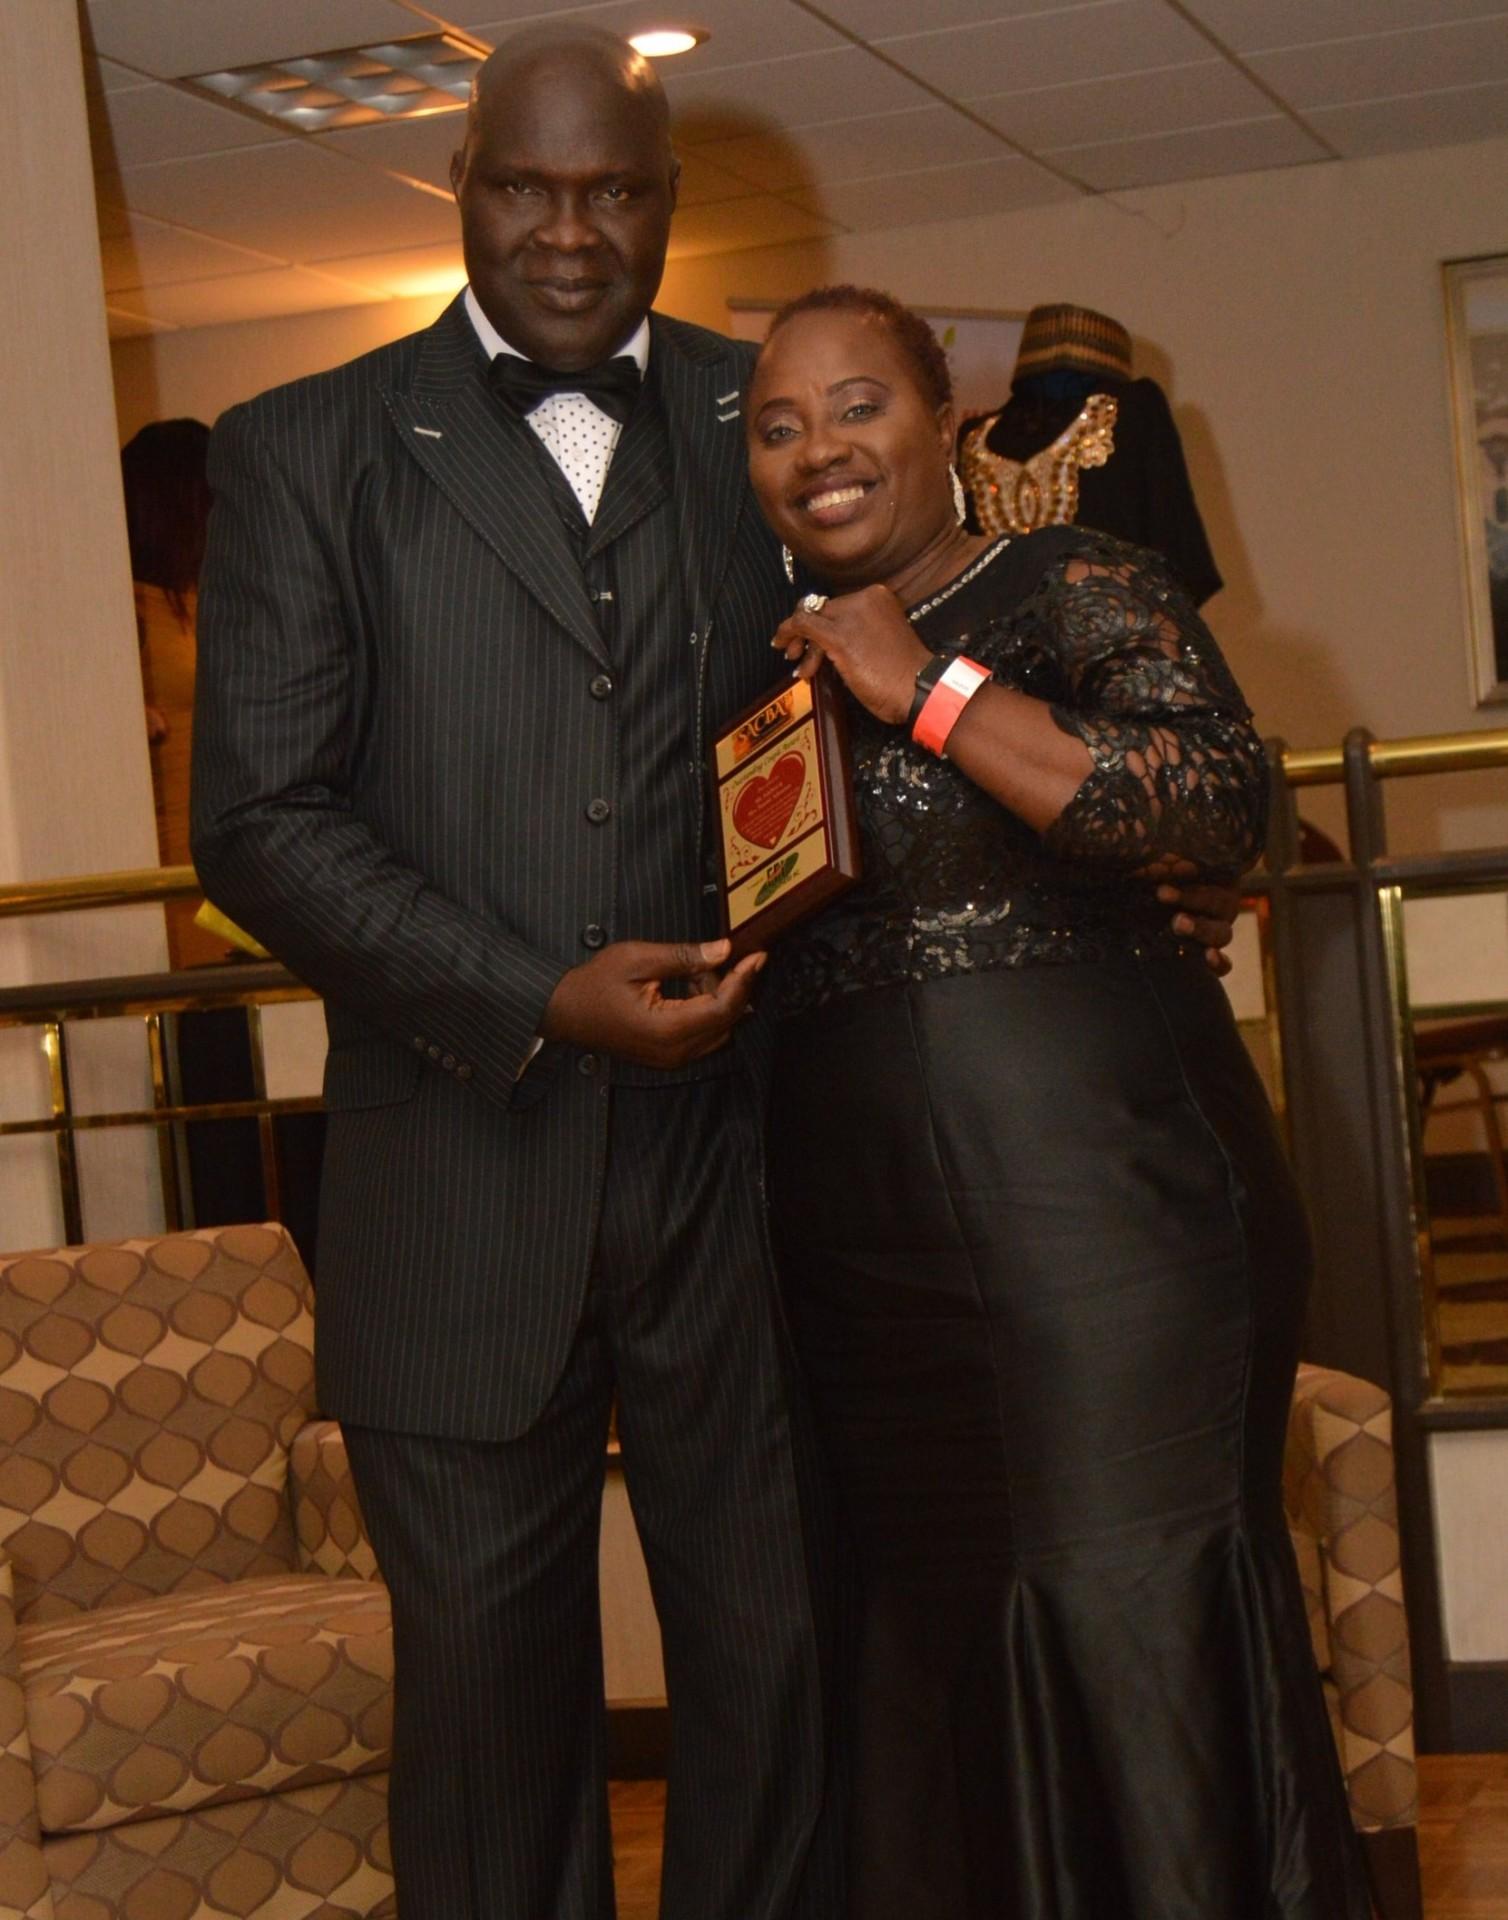 Mr. Adebisi & Mrs. Bunmi Adeniran